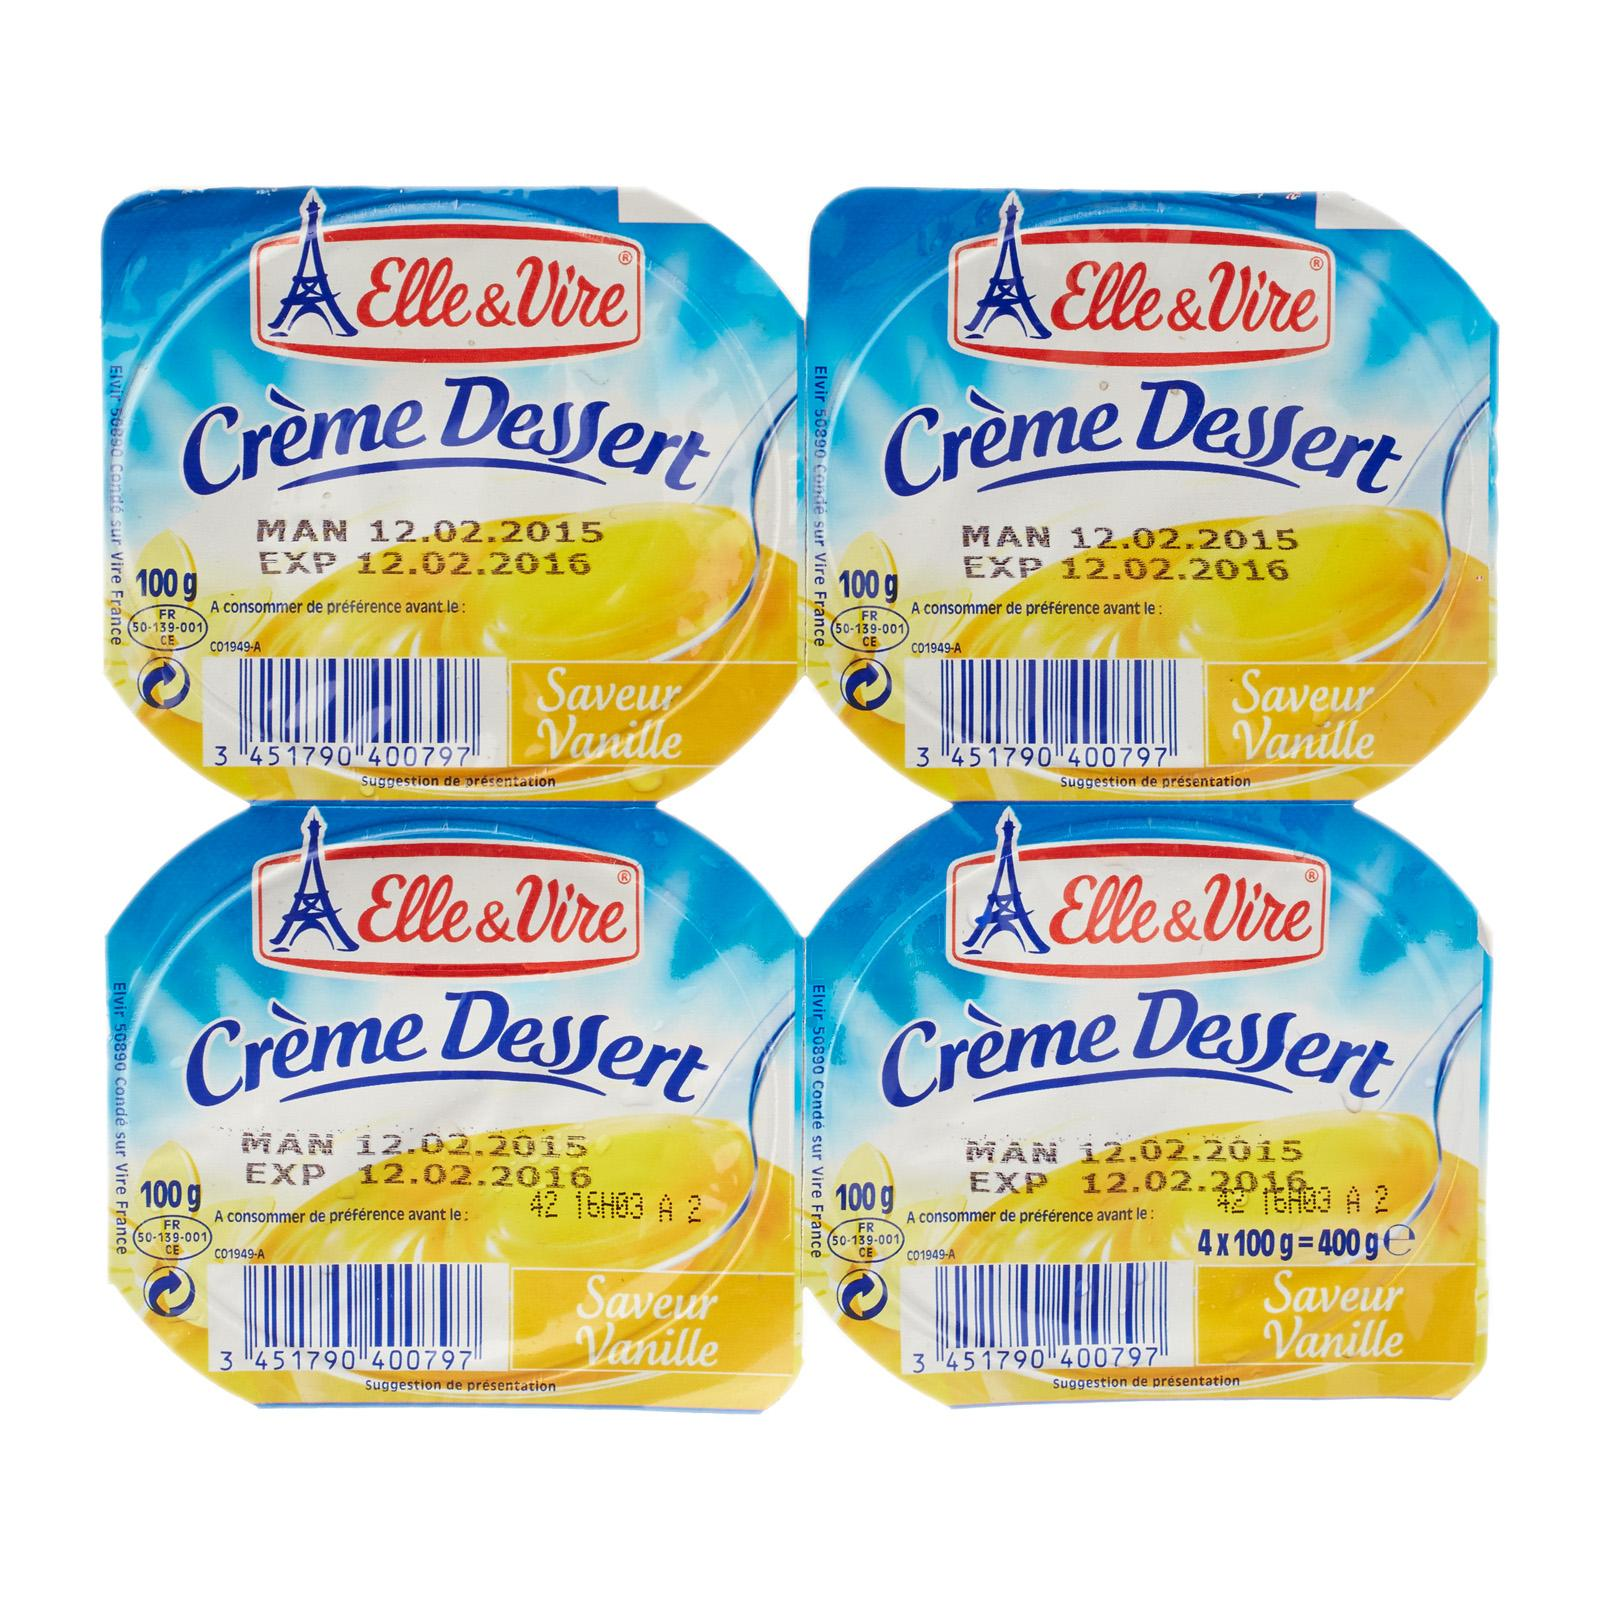 Elle Vire Cream Dessert Vanilla from RedMart - diffmarts